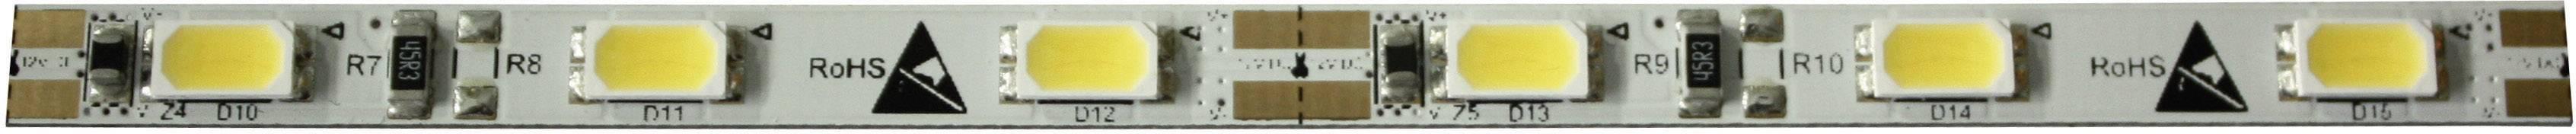 LED pásik Barthelme 50025633 50025633, 12 V, teplá biela, 25 cm